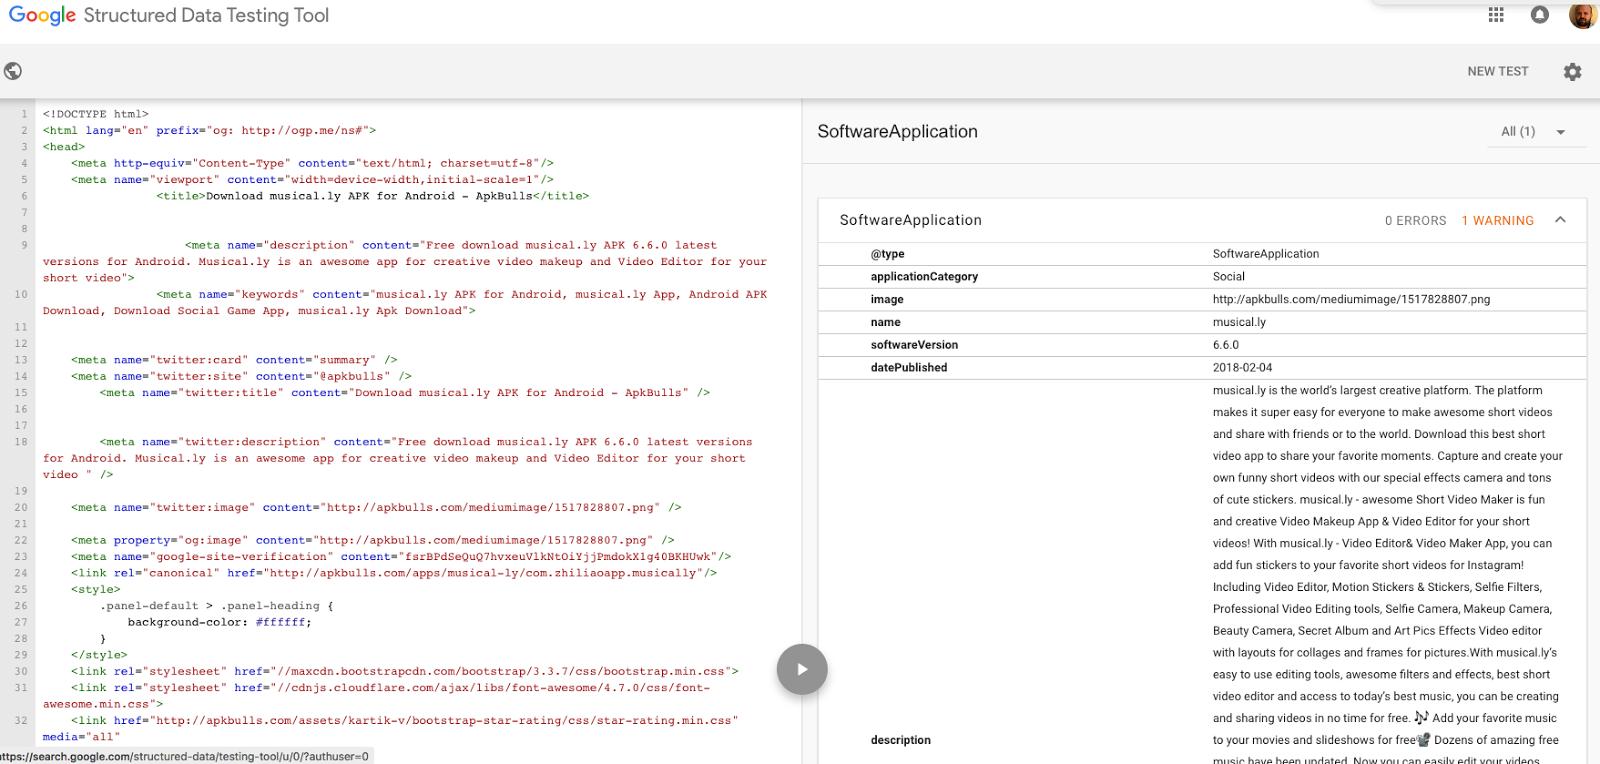 Structured Data Testing Tool returning No errors, Warning